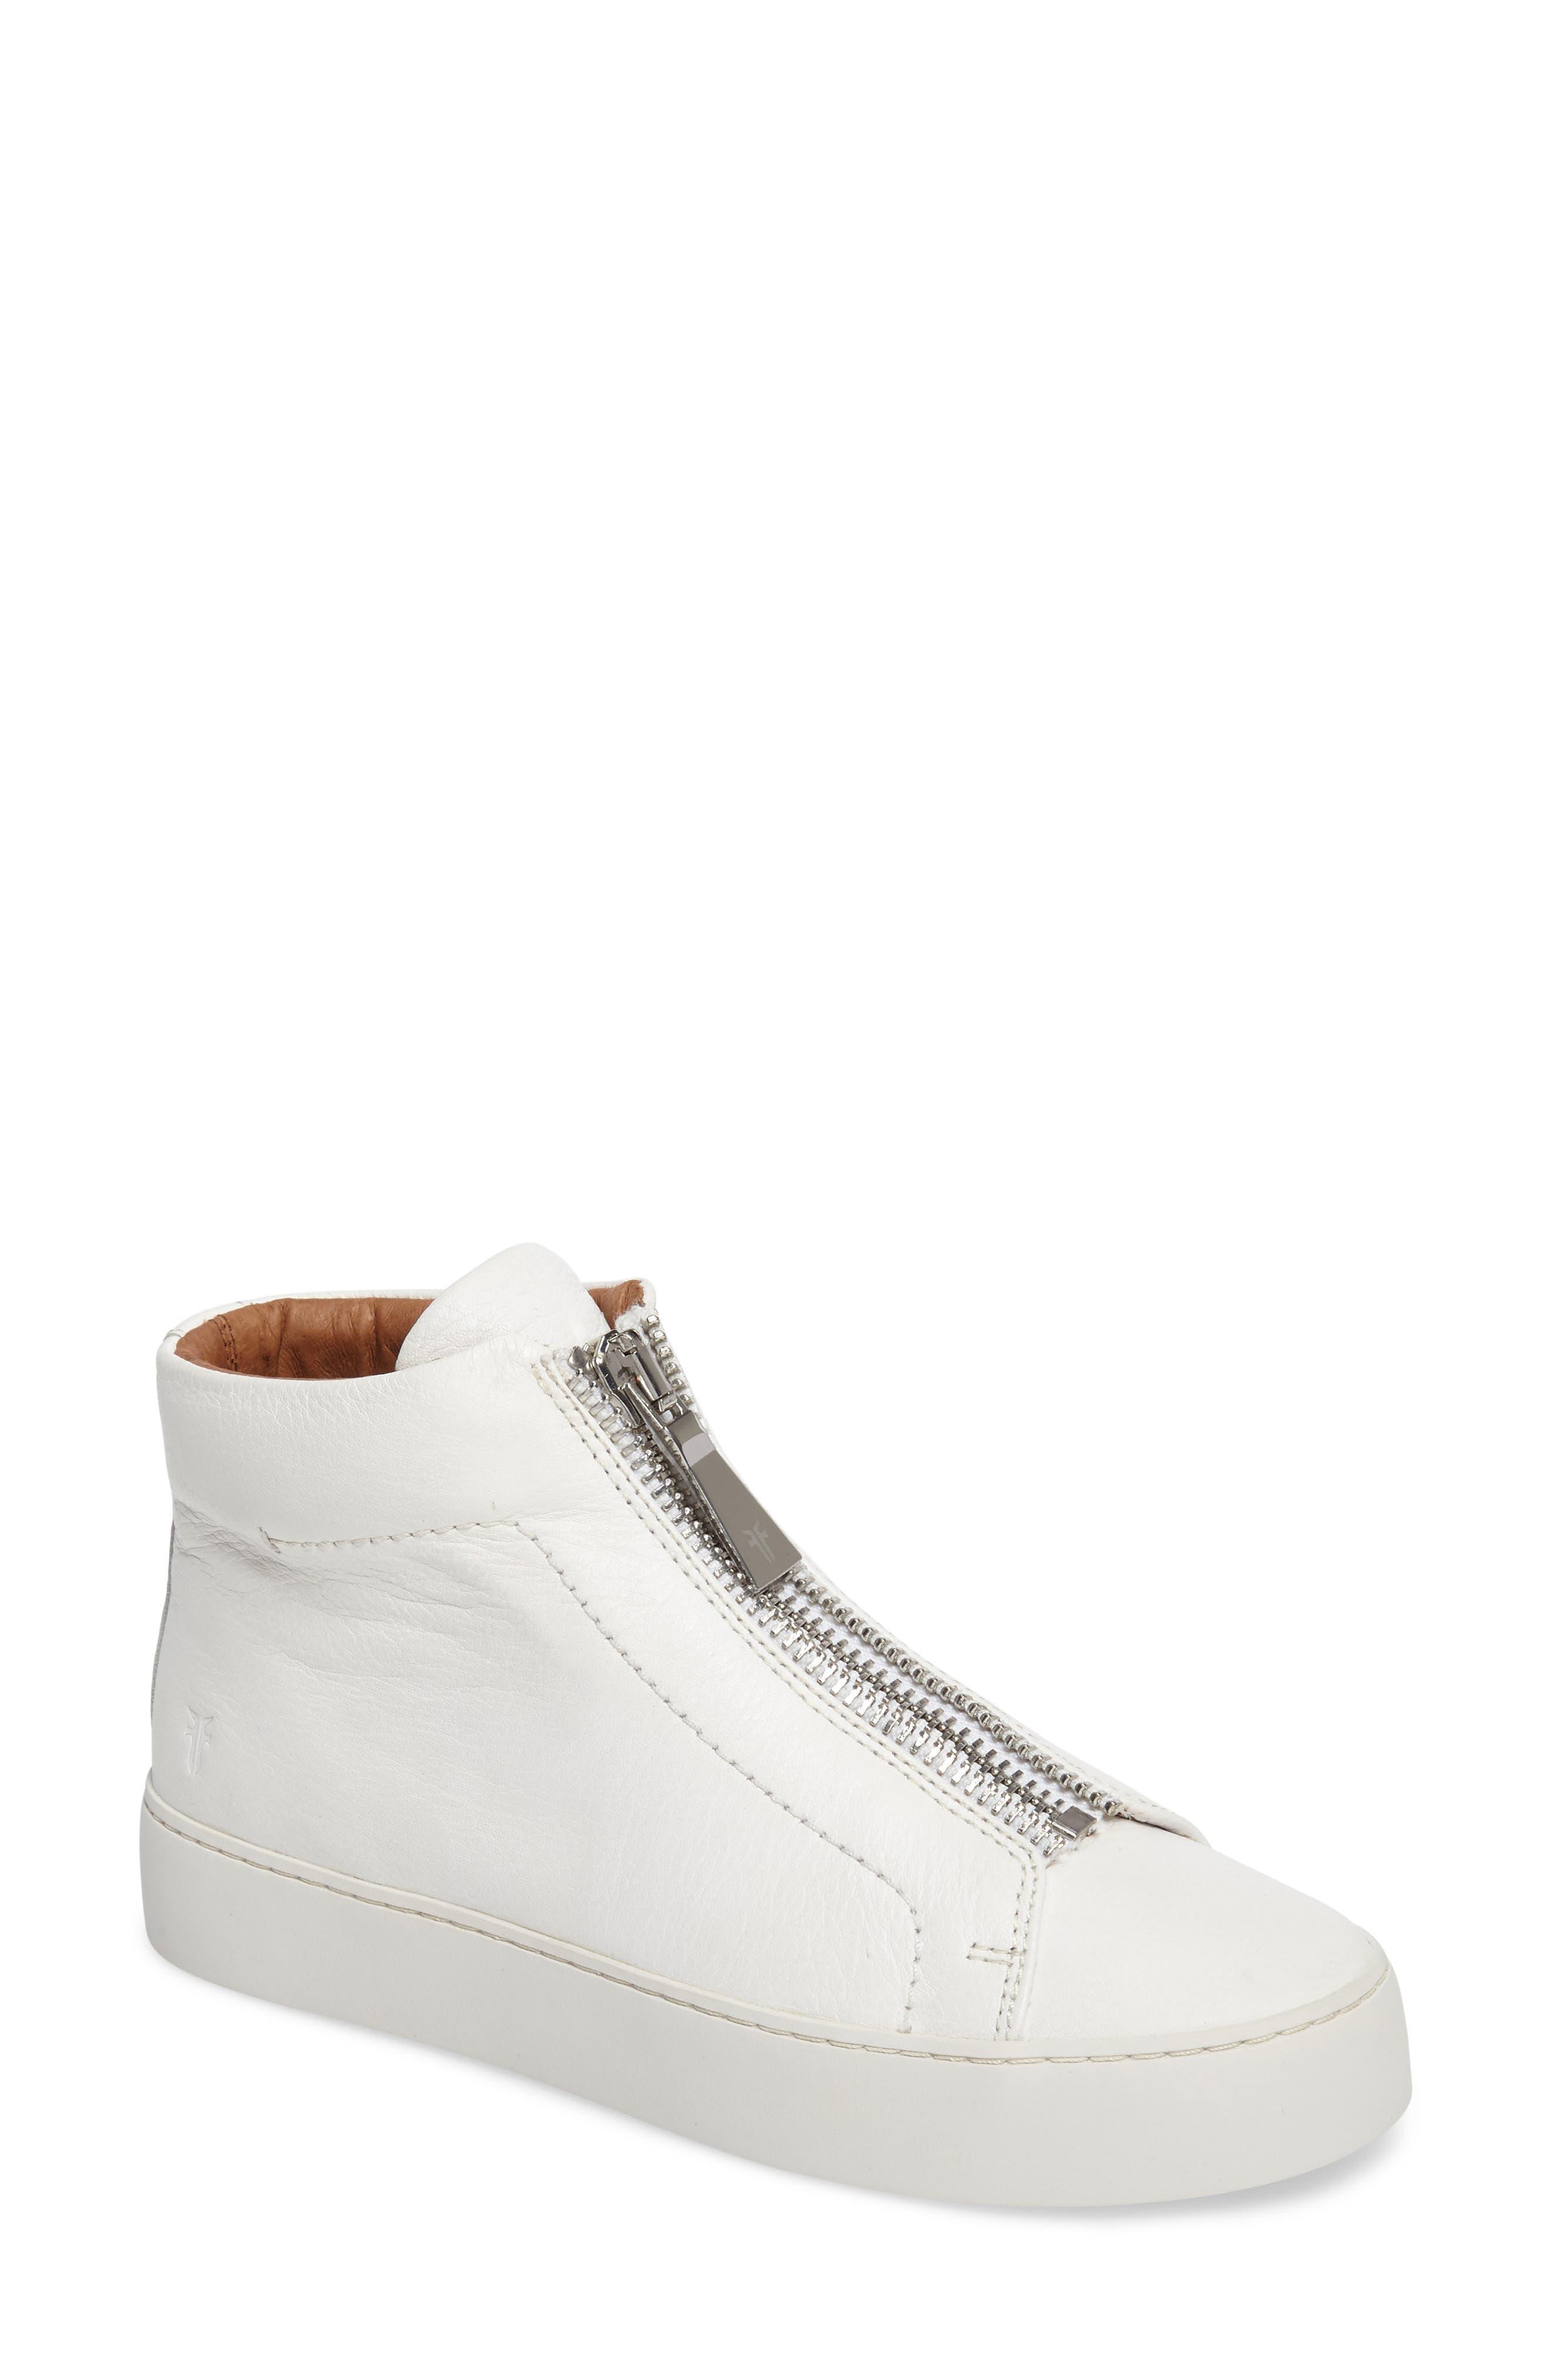 Frye Sneakers LENA ZIP HIGH TOP SNEAKER